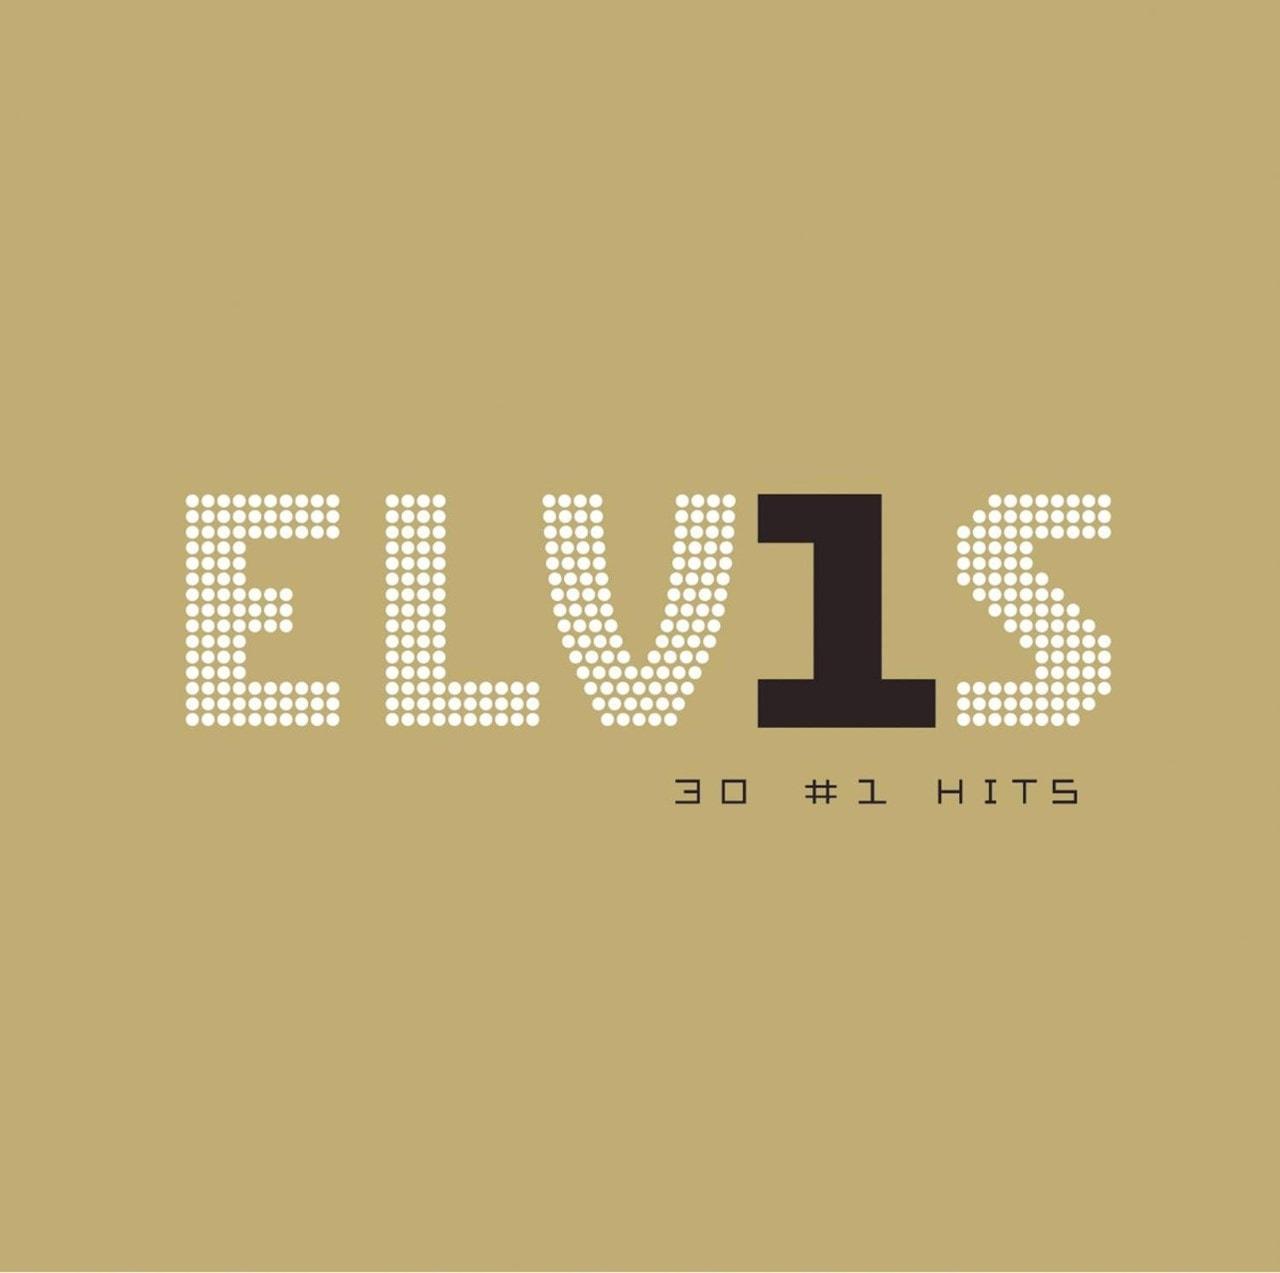 Elv1s: 30 #1 Hits - 1